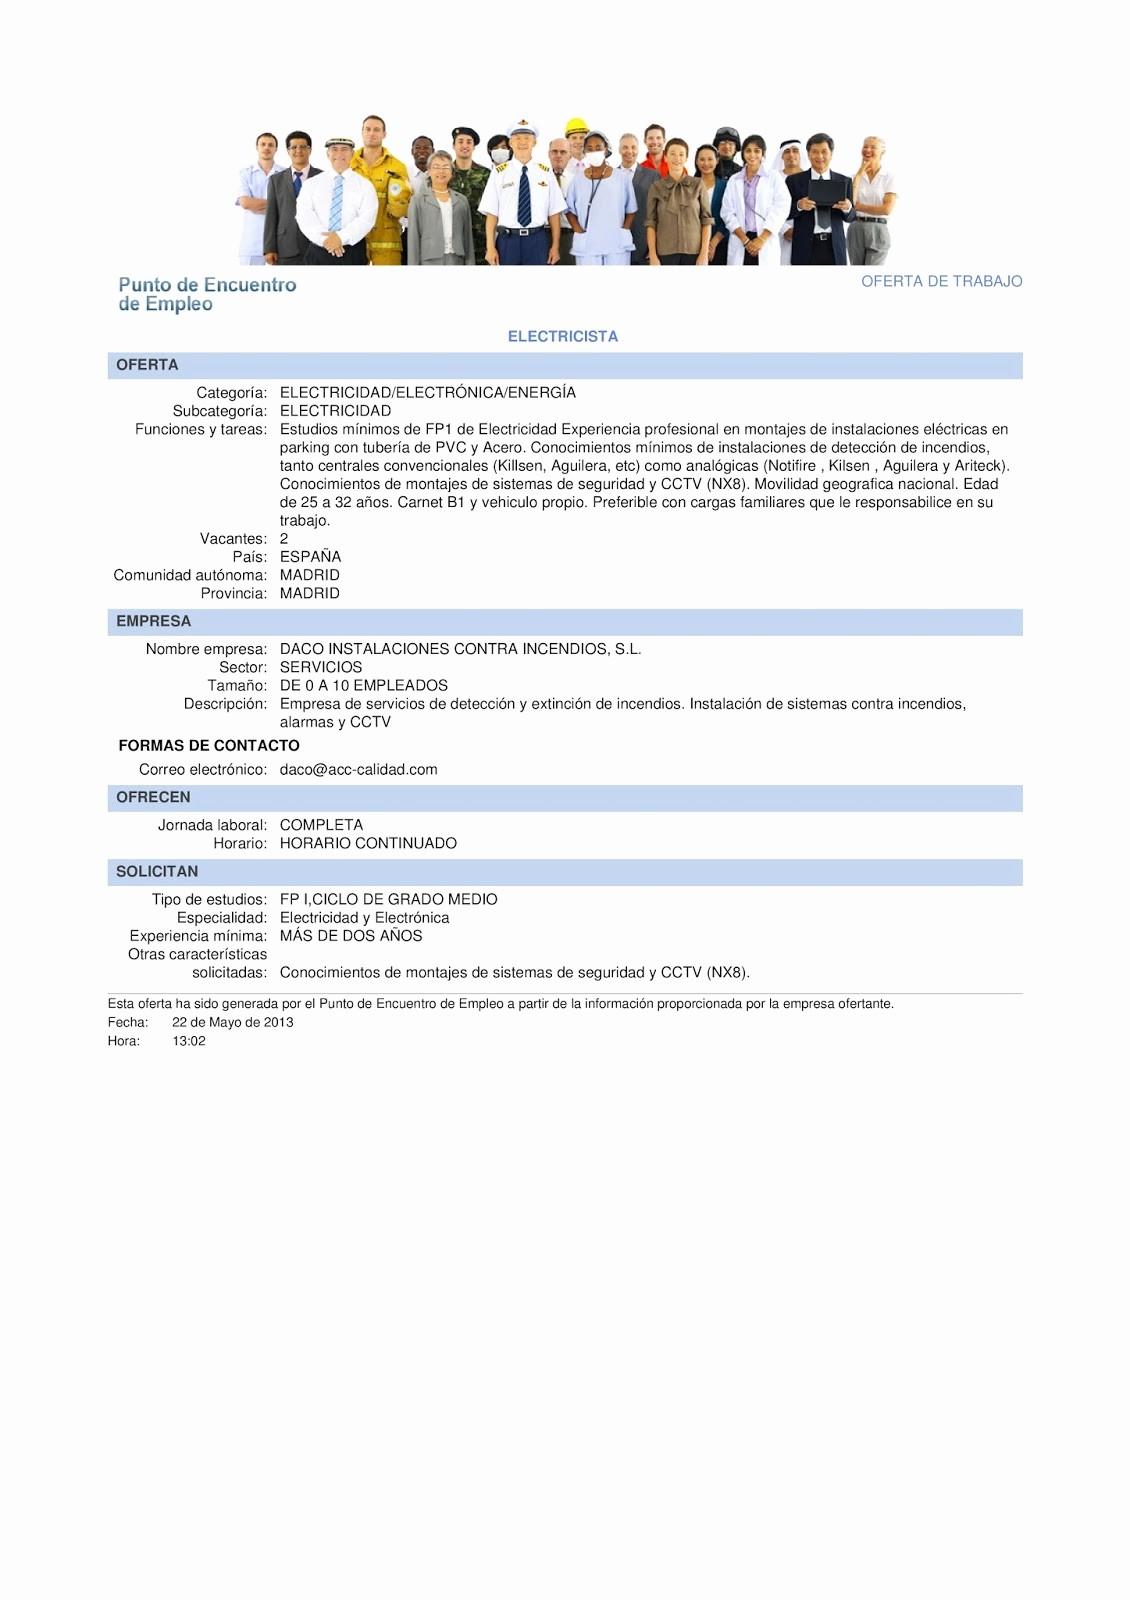 Carta De Oferta De Trabajo Lovely Mi Curriculum 5 Ofertas De Empleo Y Carta De Presentacion